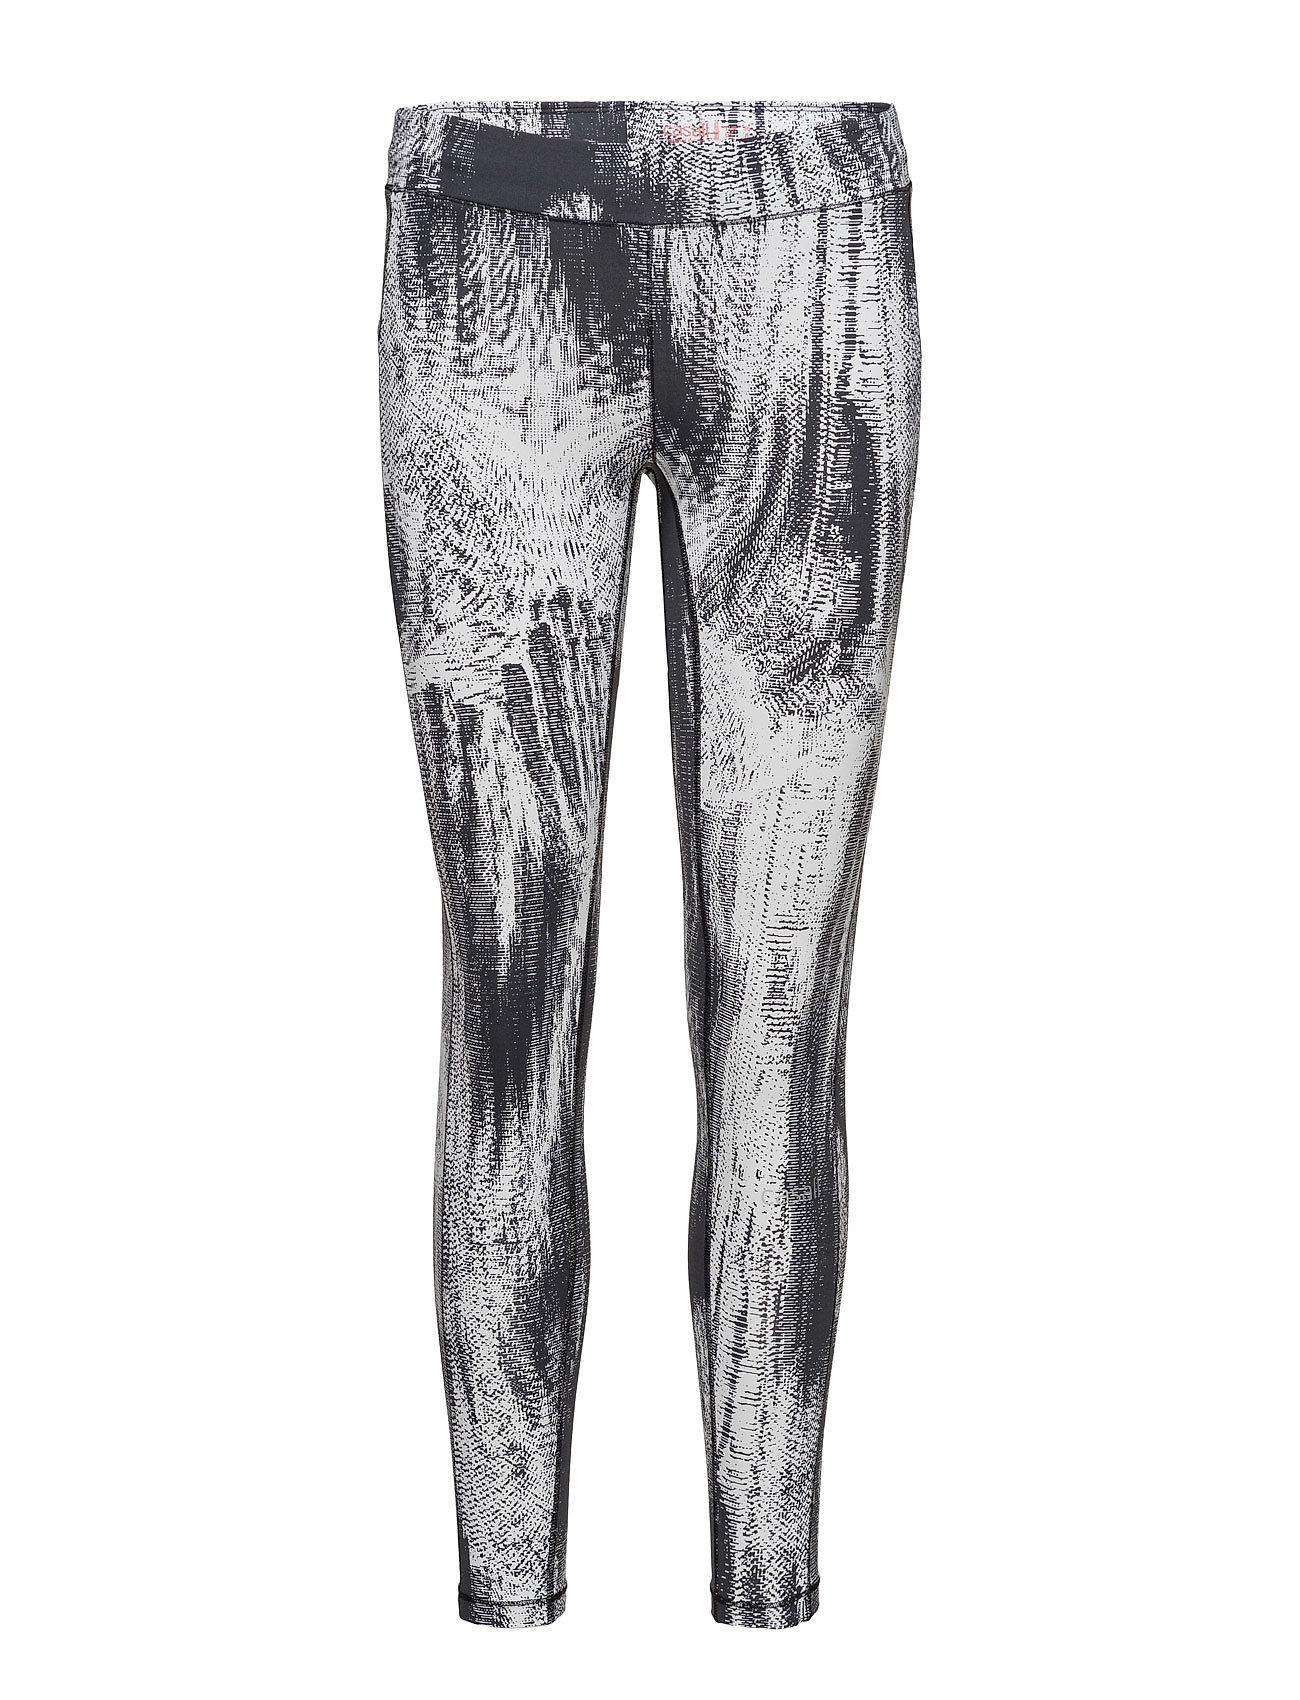 Oblique 7/8 Tights Casall Trænings leggings til Damer i